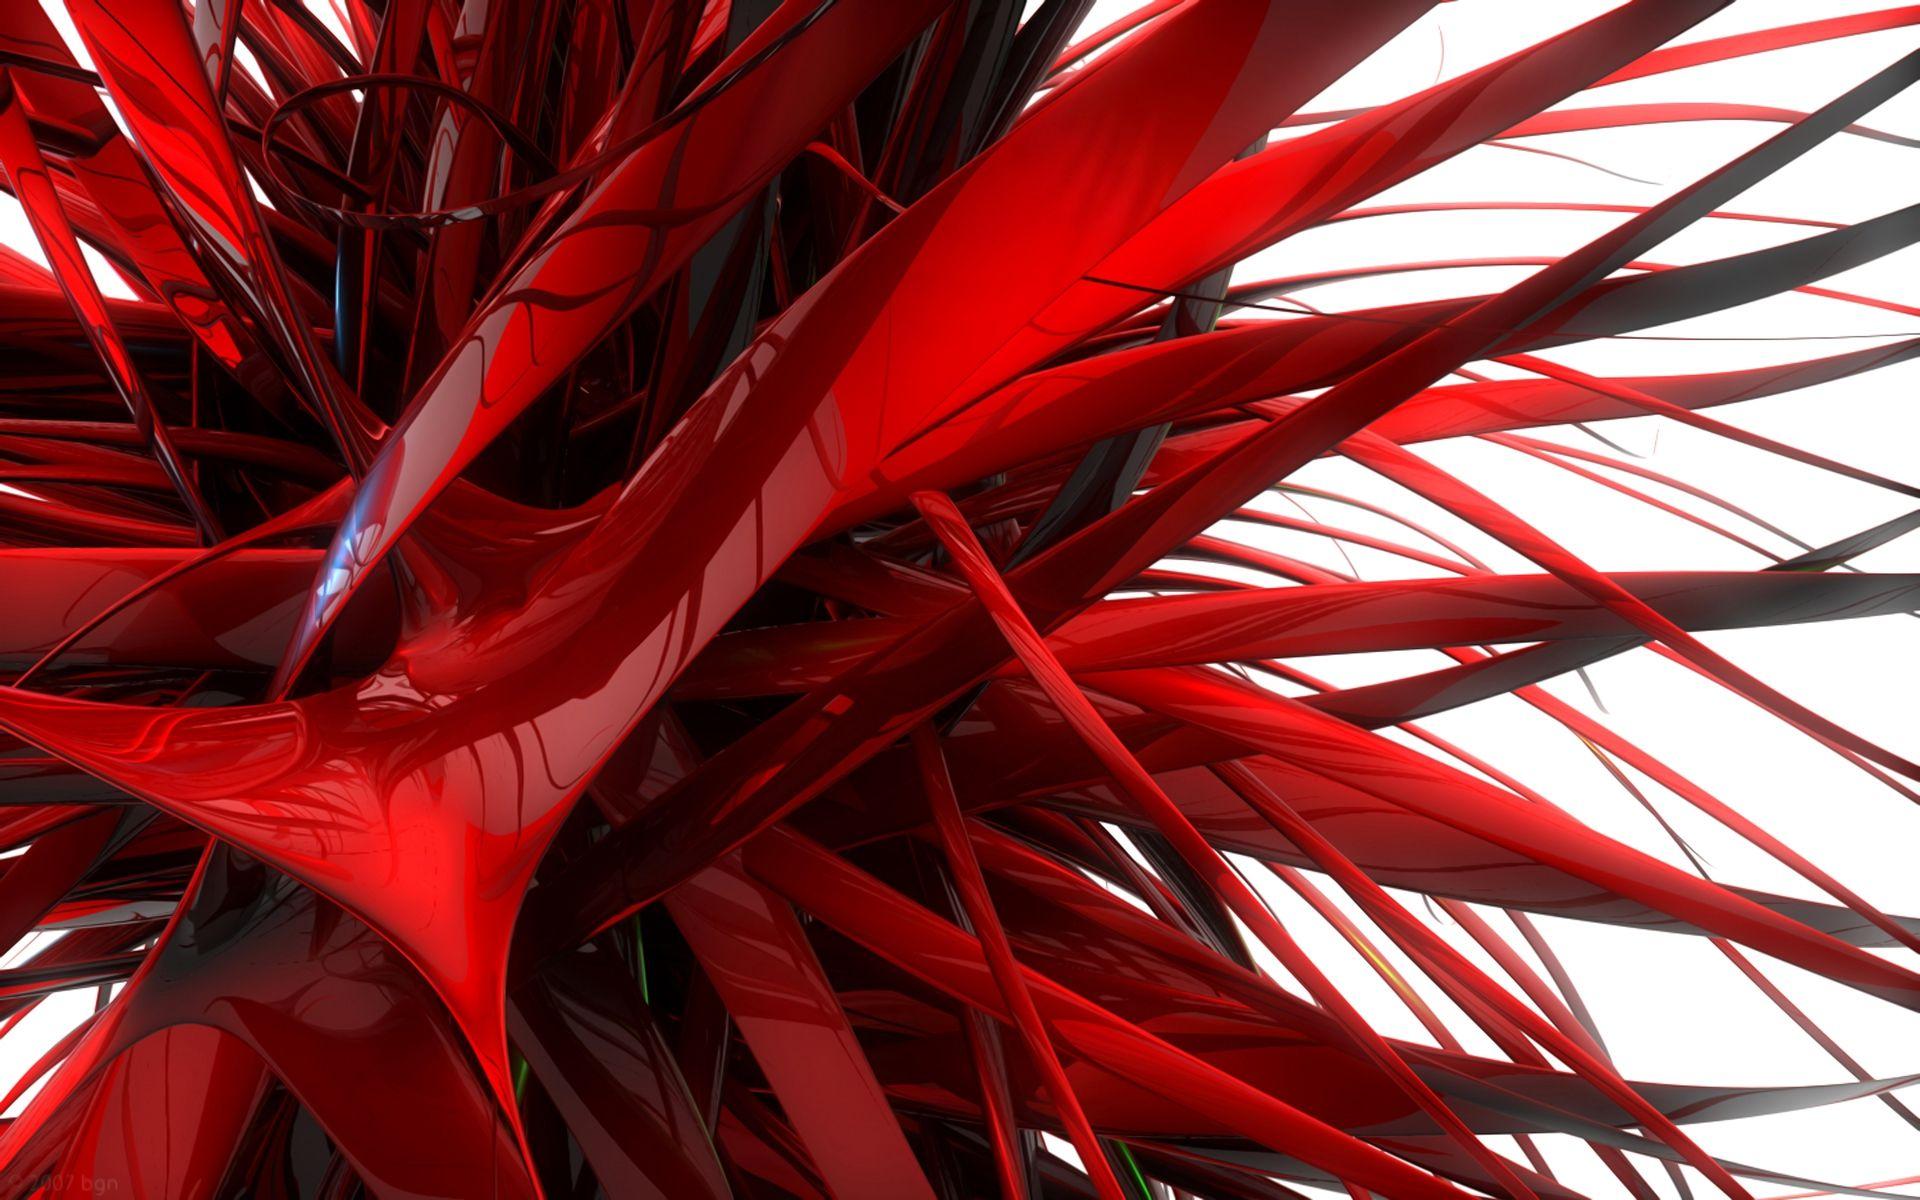 hd 4k abstract - photo #47